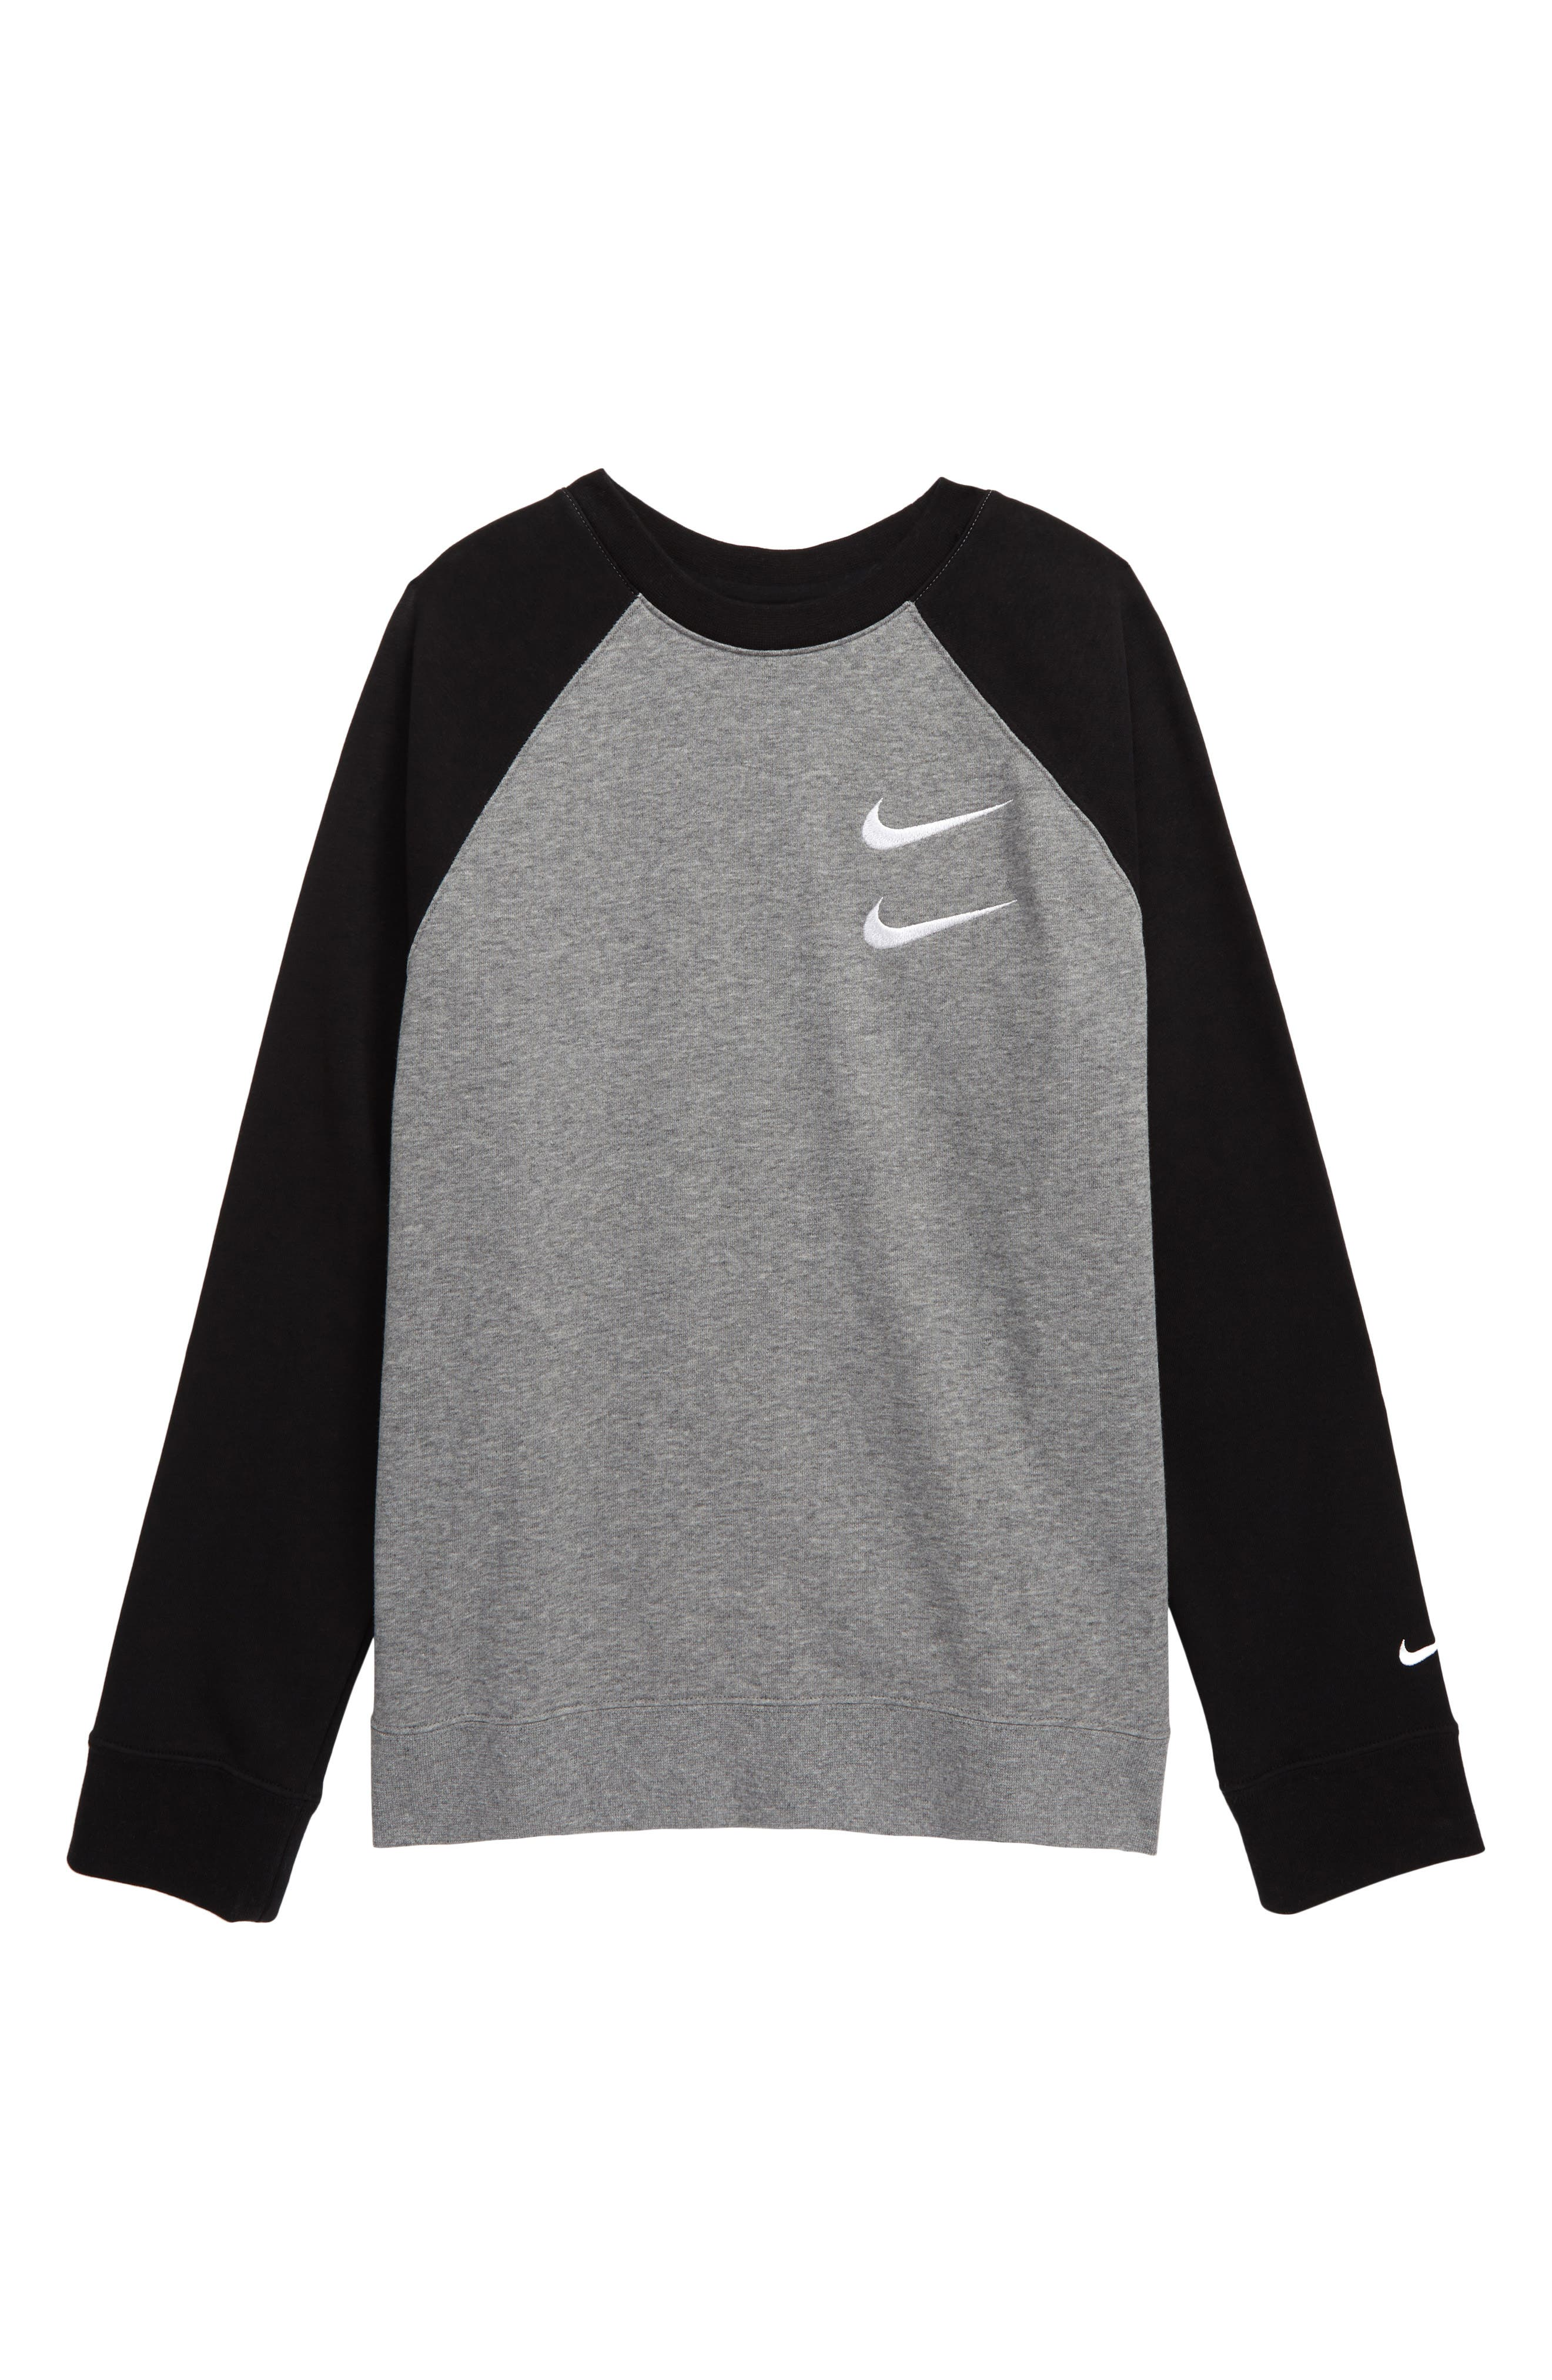 Nike Sportswear Men/'s Carbon Gray Crew-Neck Graphic Tank Top